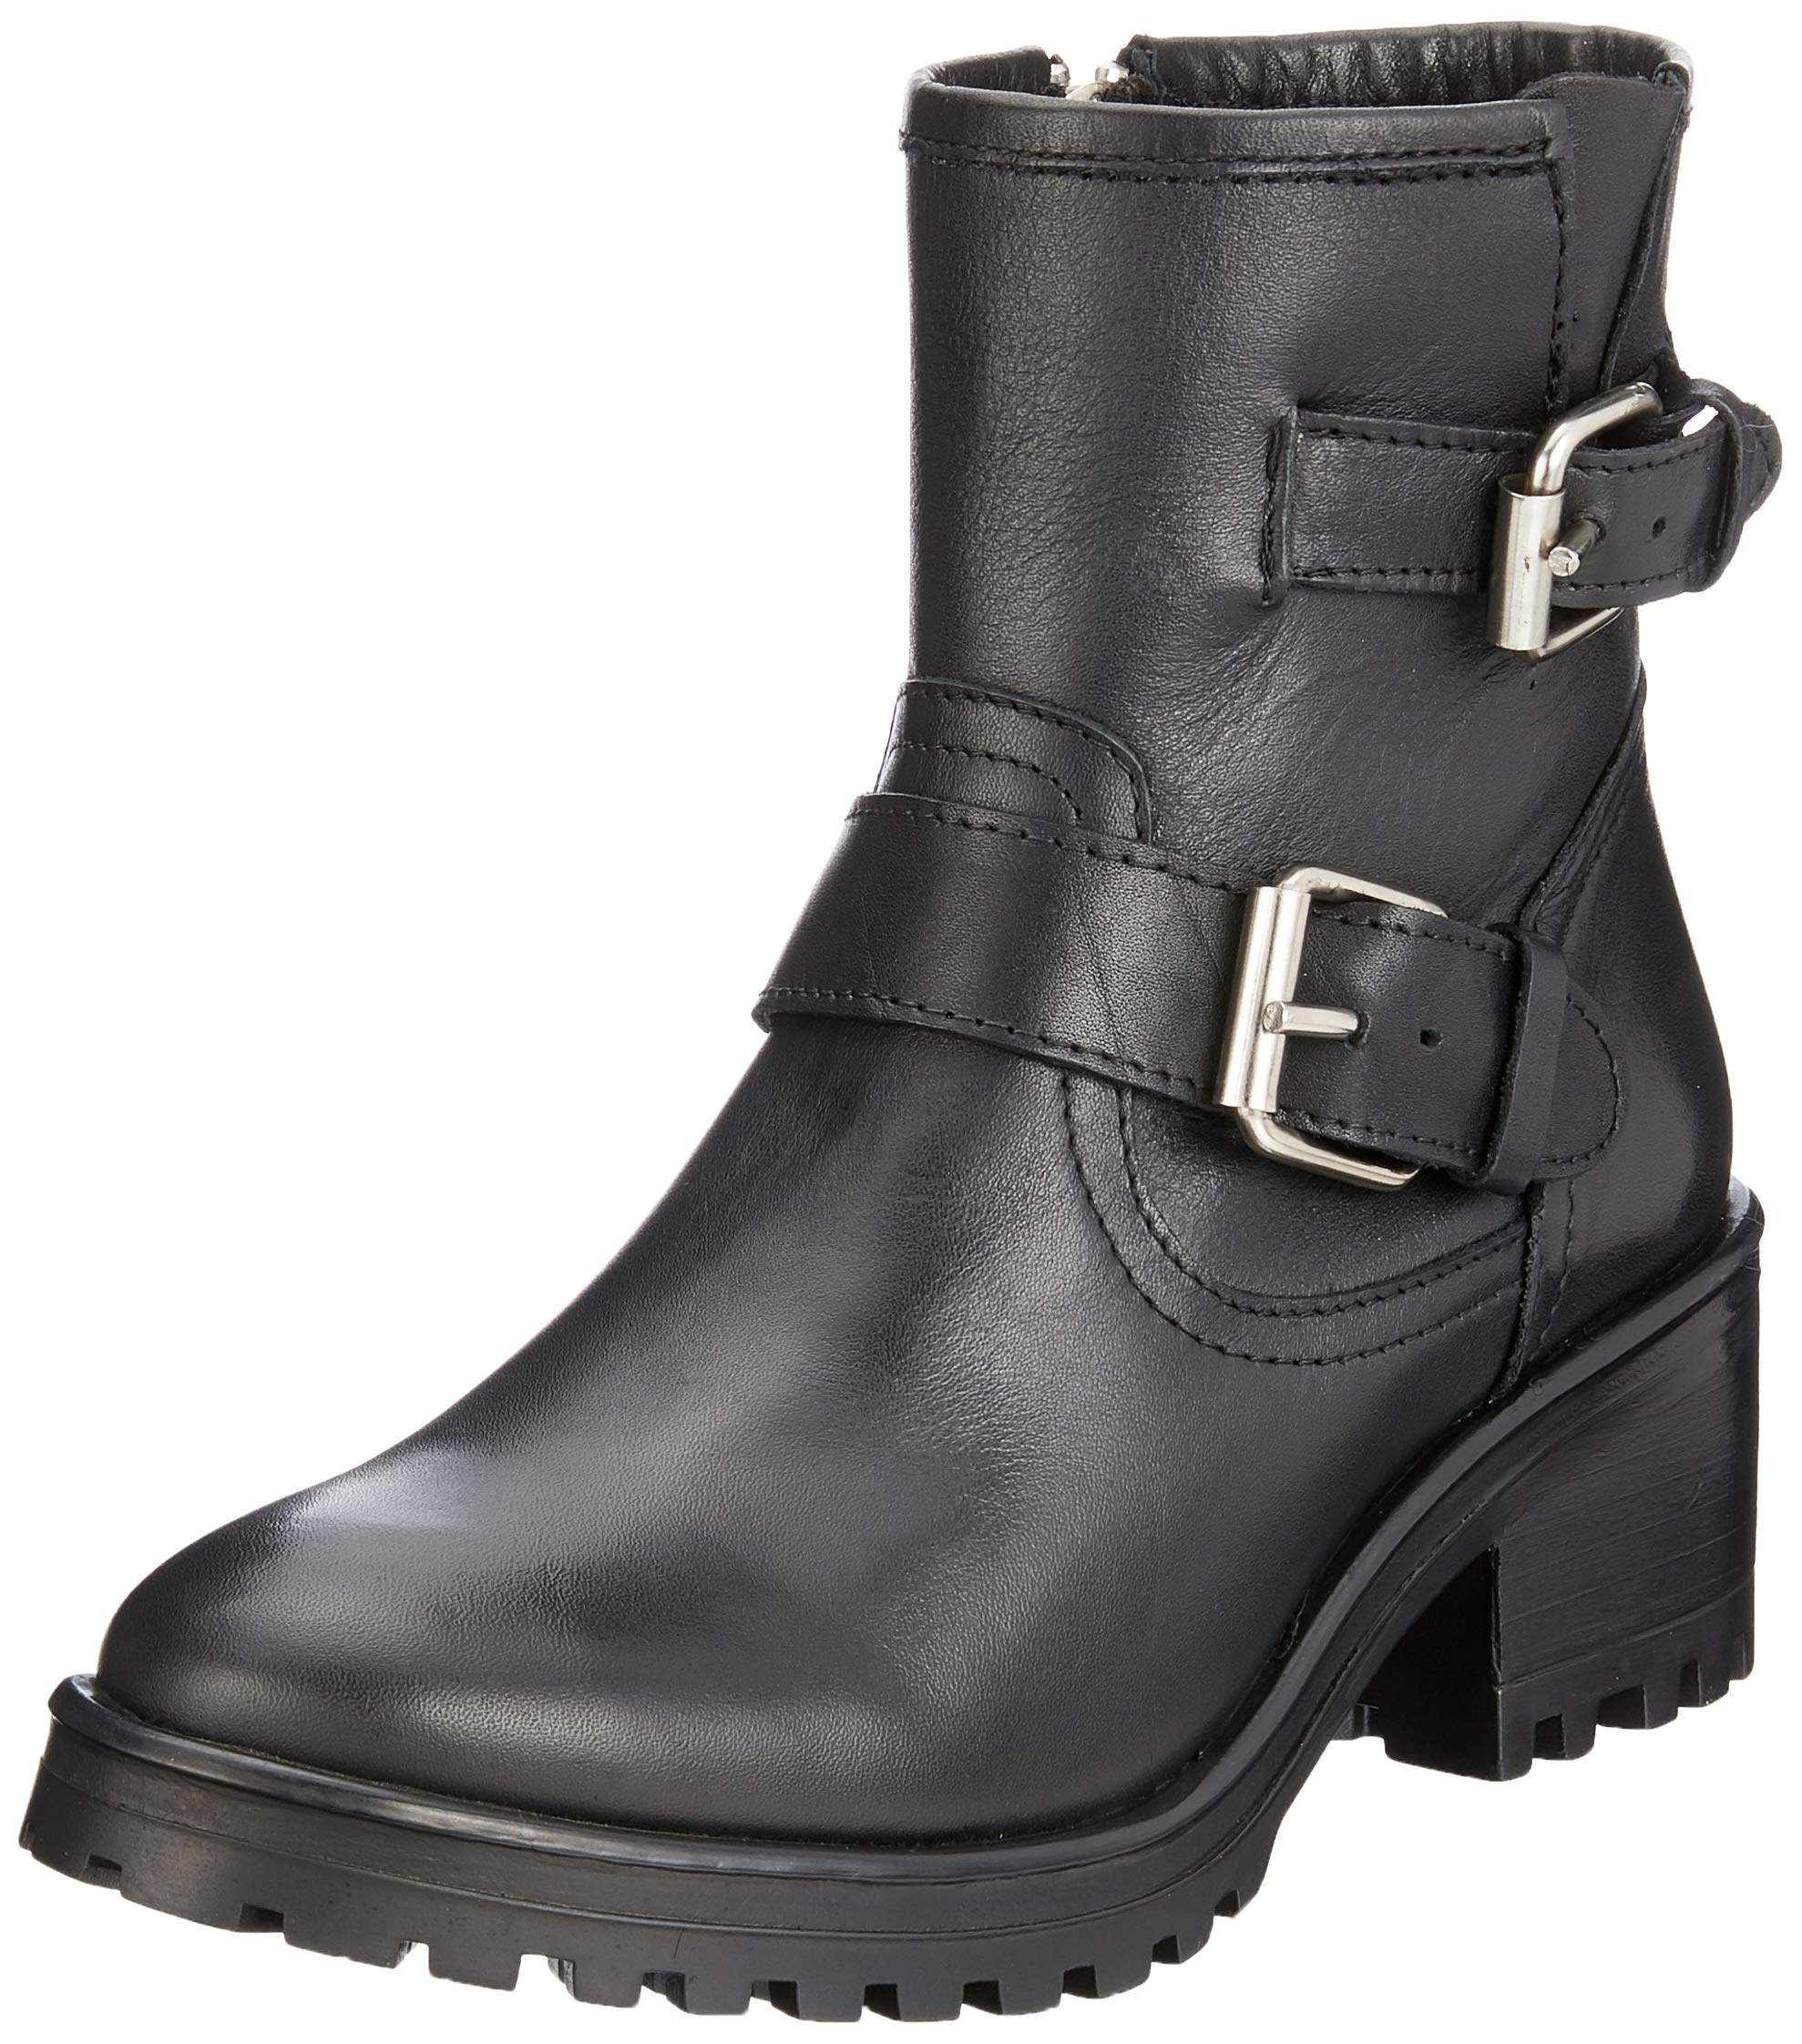 Classiques Madden FemmeNoirblack AnklebootBottes Steve 01739 Gain Leather Eu wOkiZPuTX